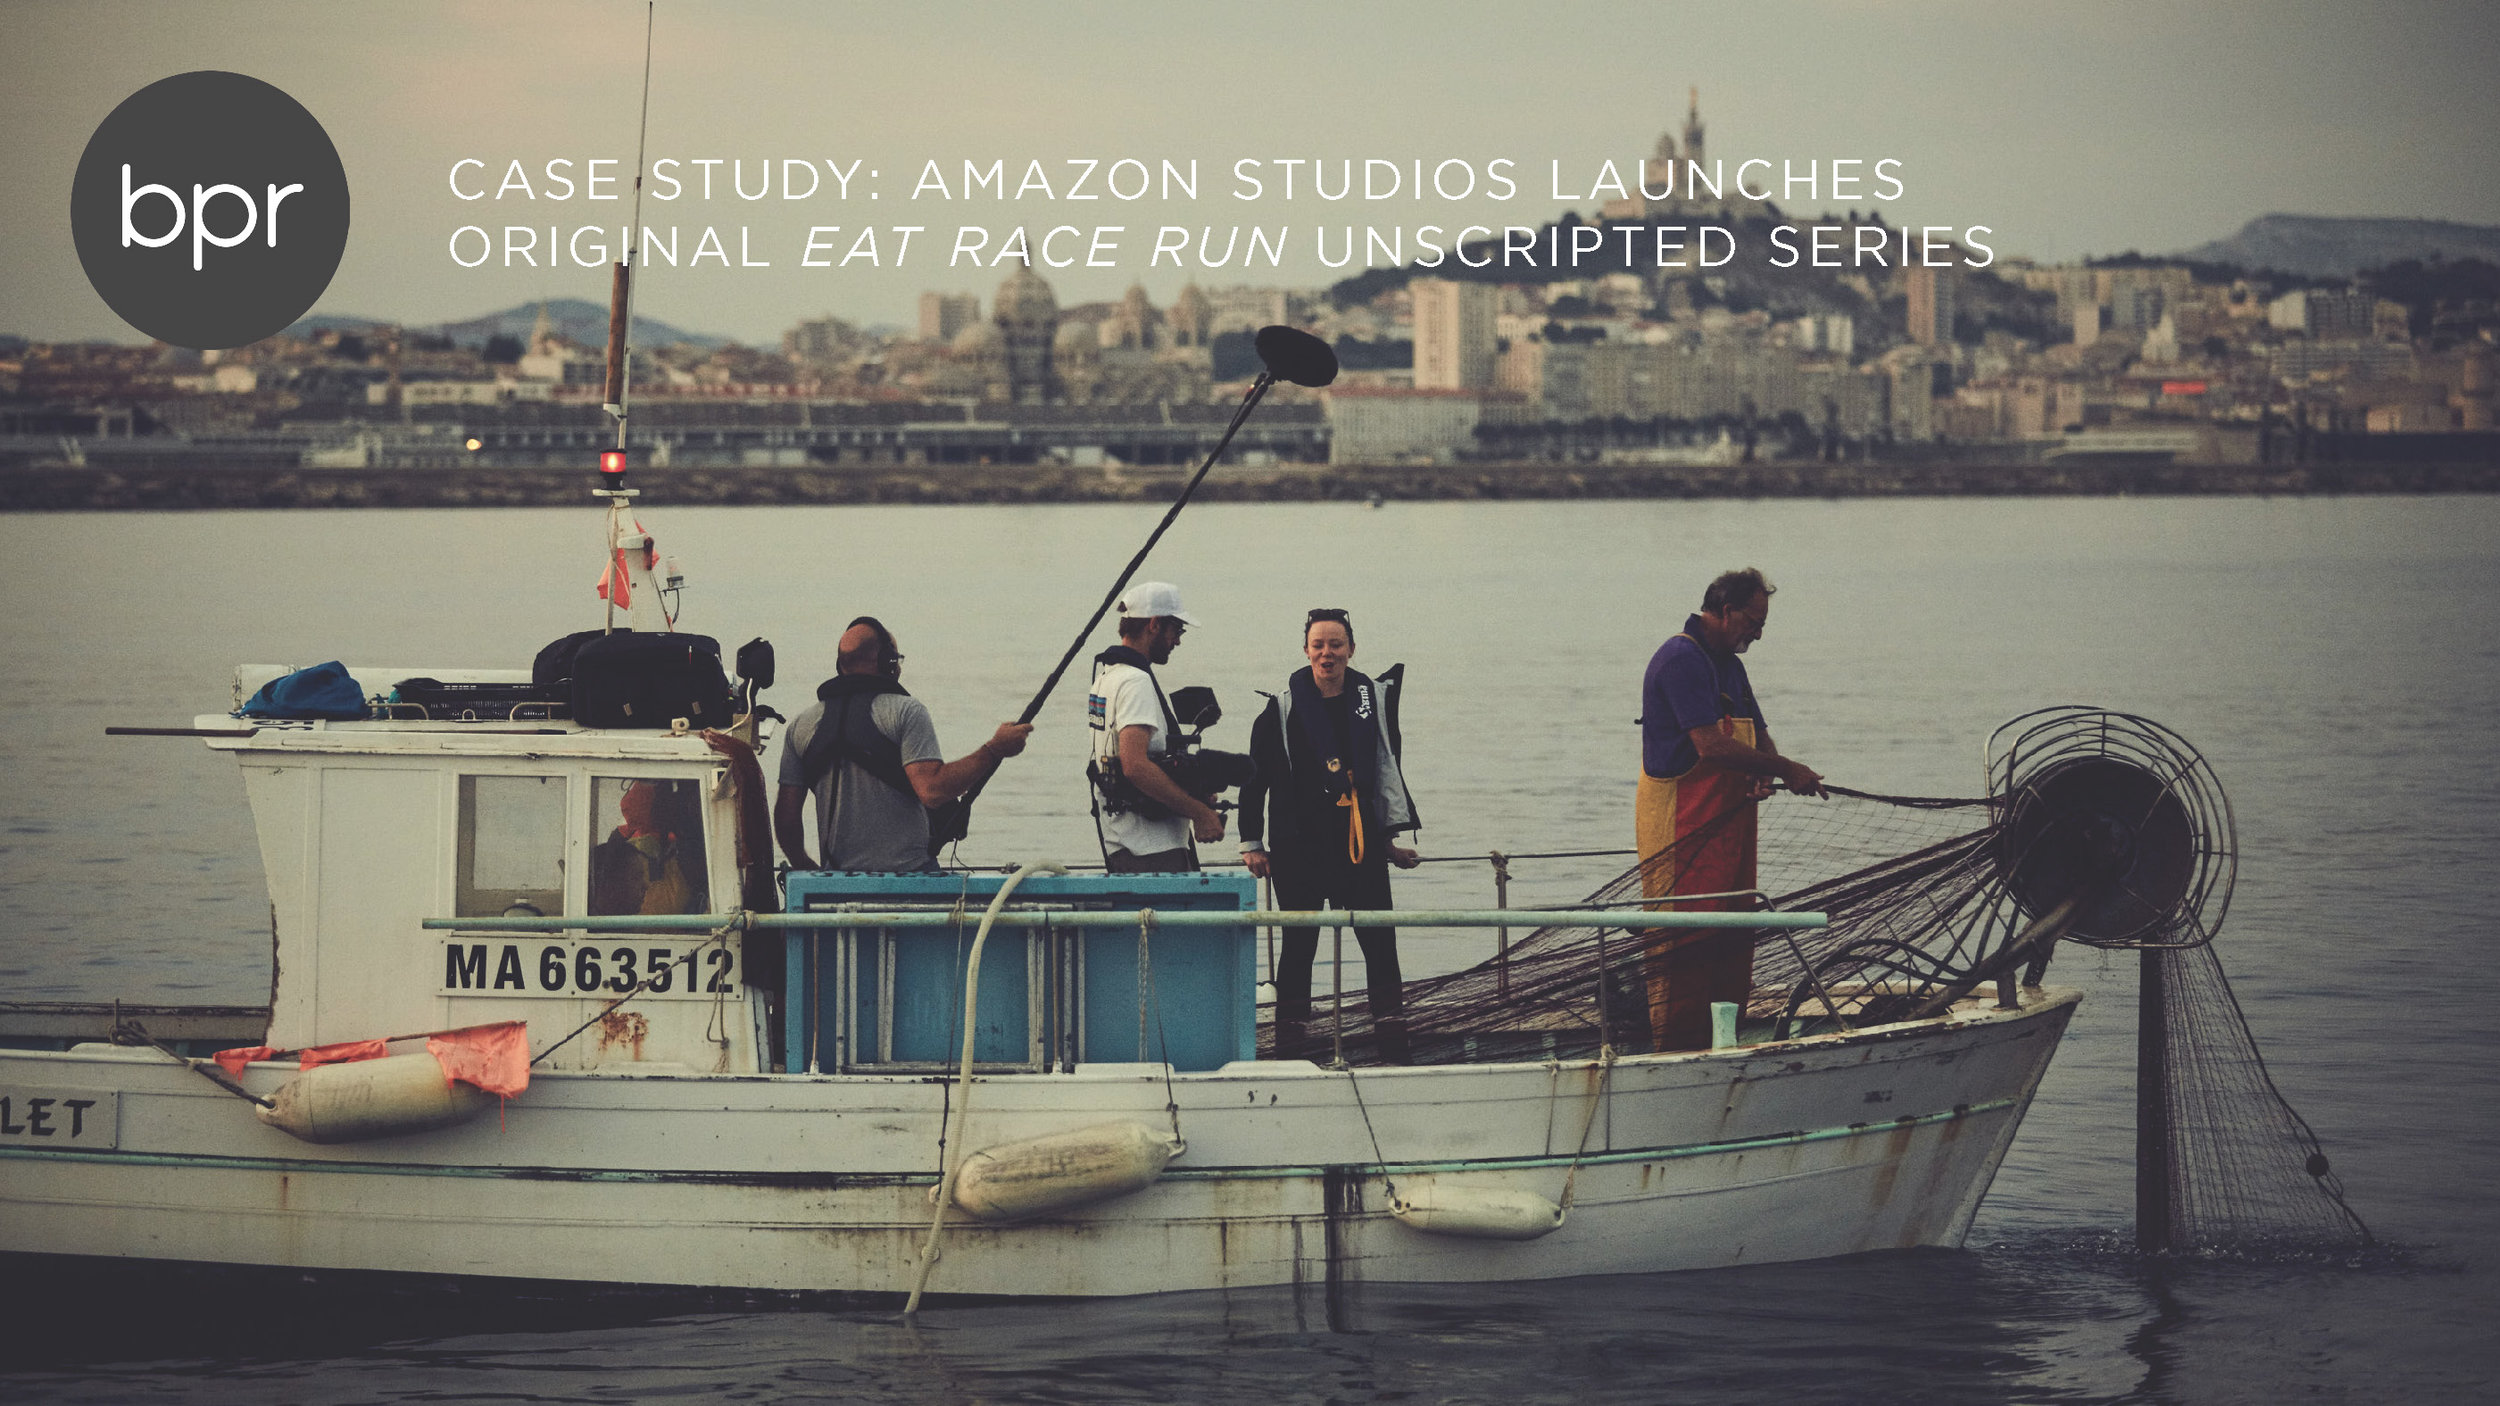 Amazon Studios Case Study_Page_1.jpg